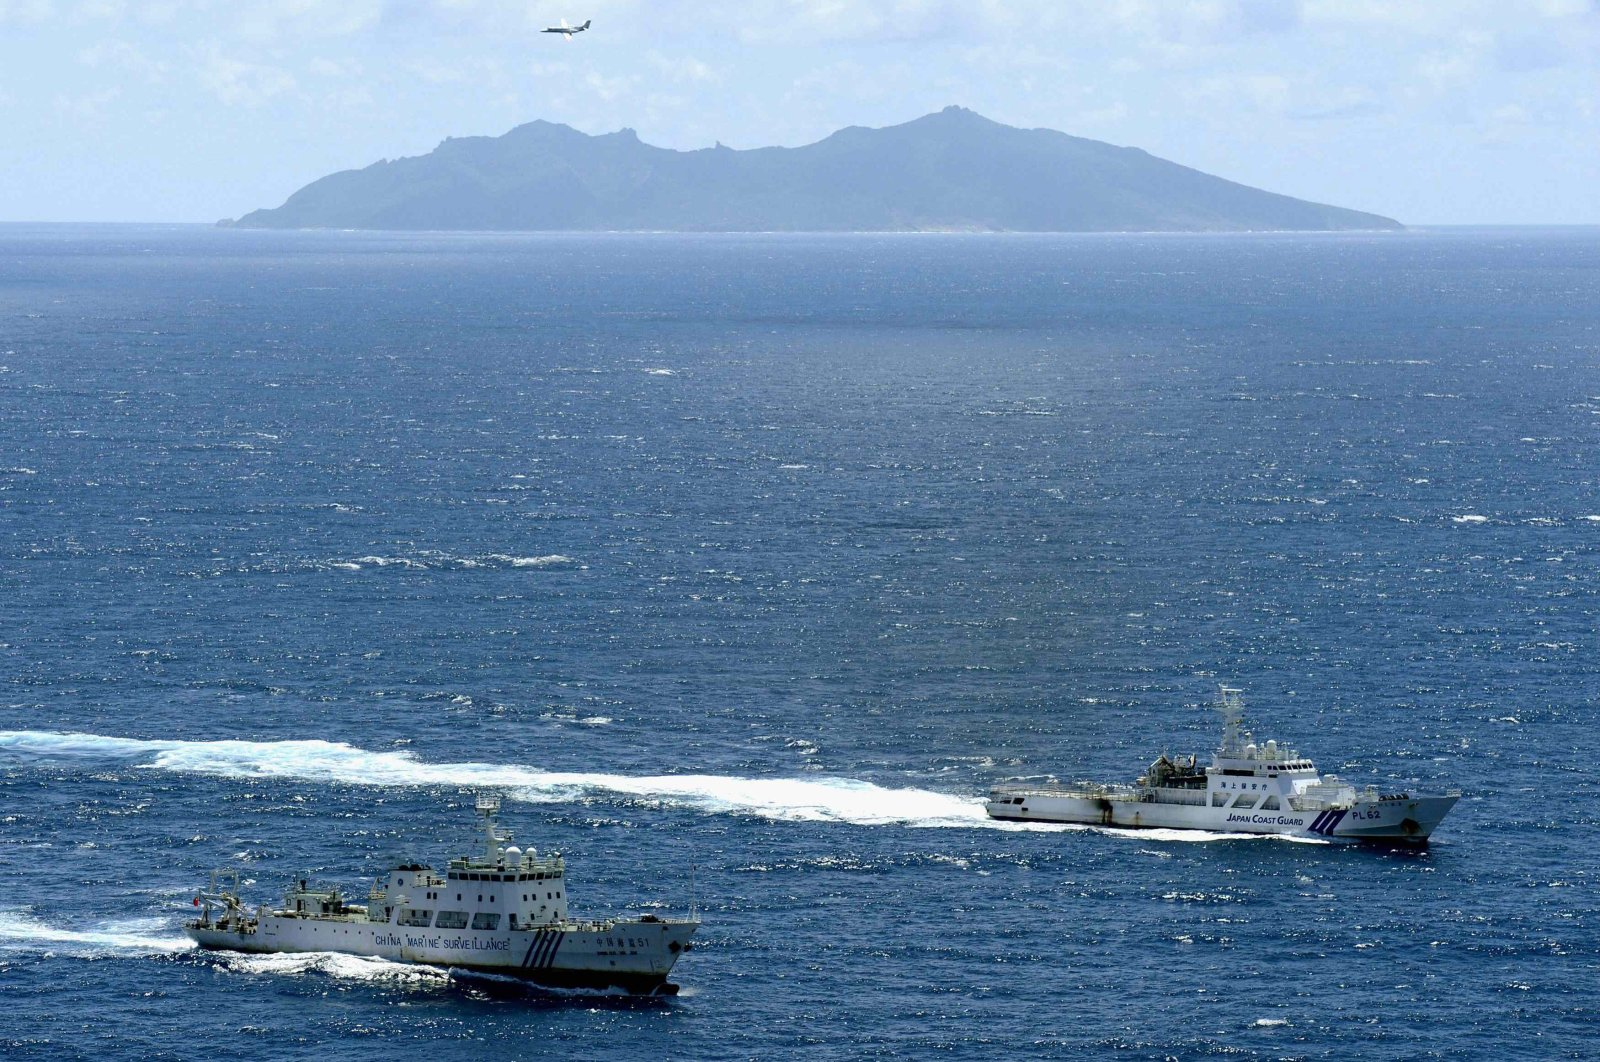 An aerial photo shows the Chinese marine surveillance ship Haijian No. 51 (L) cruising as a Japan Coast Guard ship Ishigaki sails near Uotsuri island, one of the disputed islands, called Senkaku in Japan and Diaoyu in China, in the East China Sea on Sept. 14, 2012. (Reuters Photo)